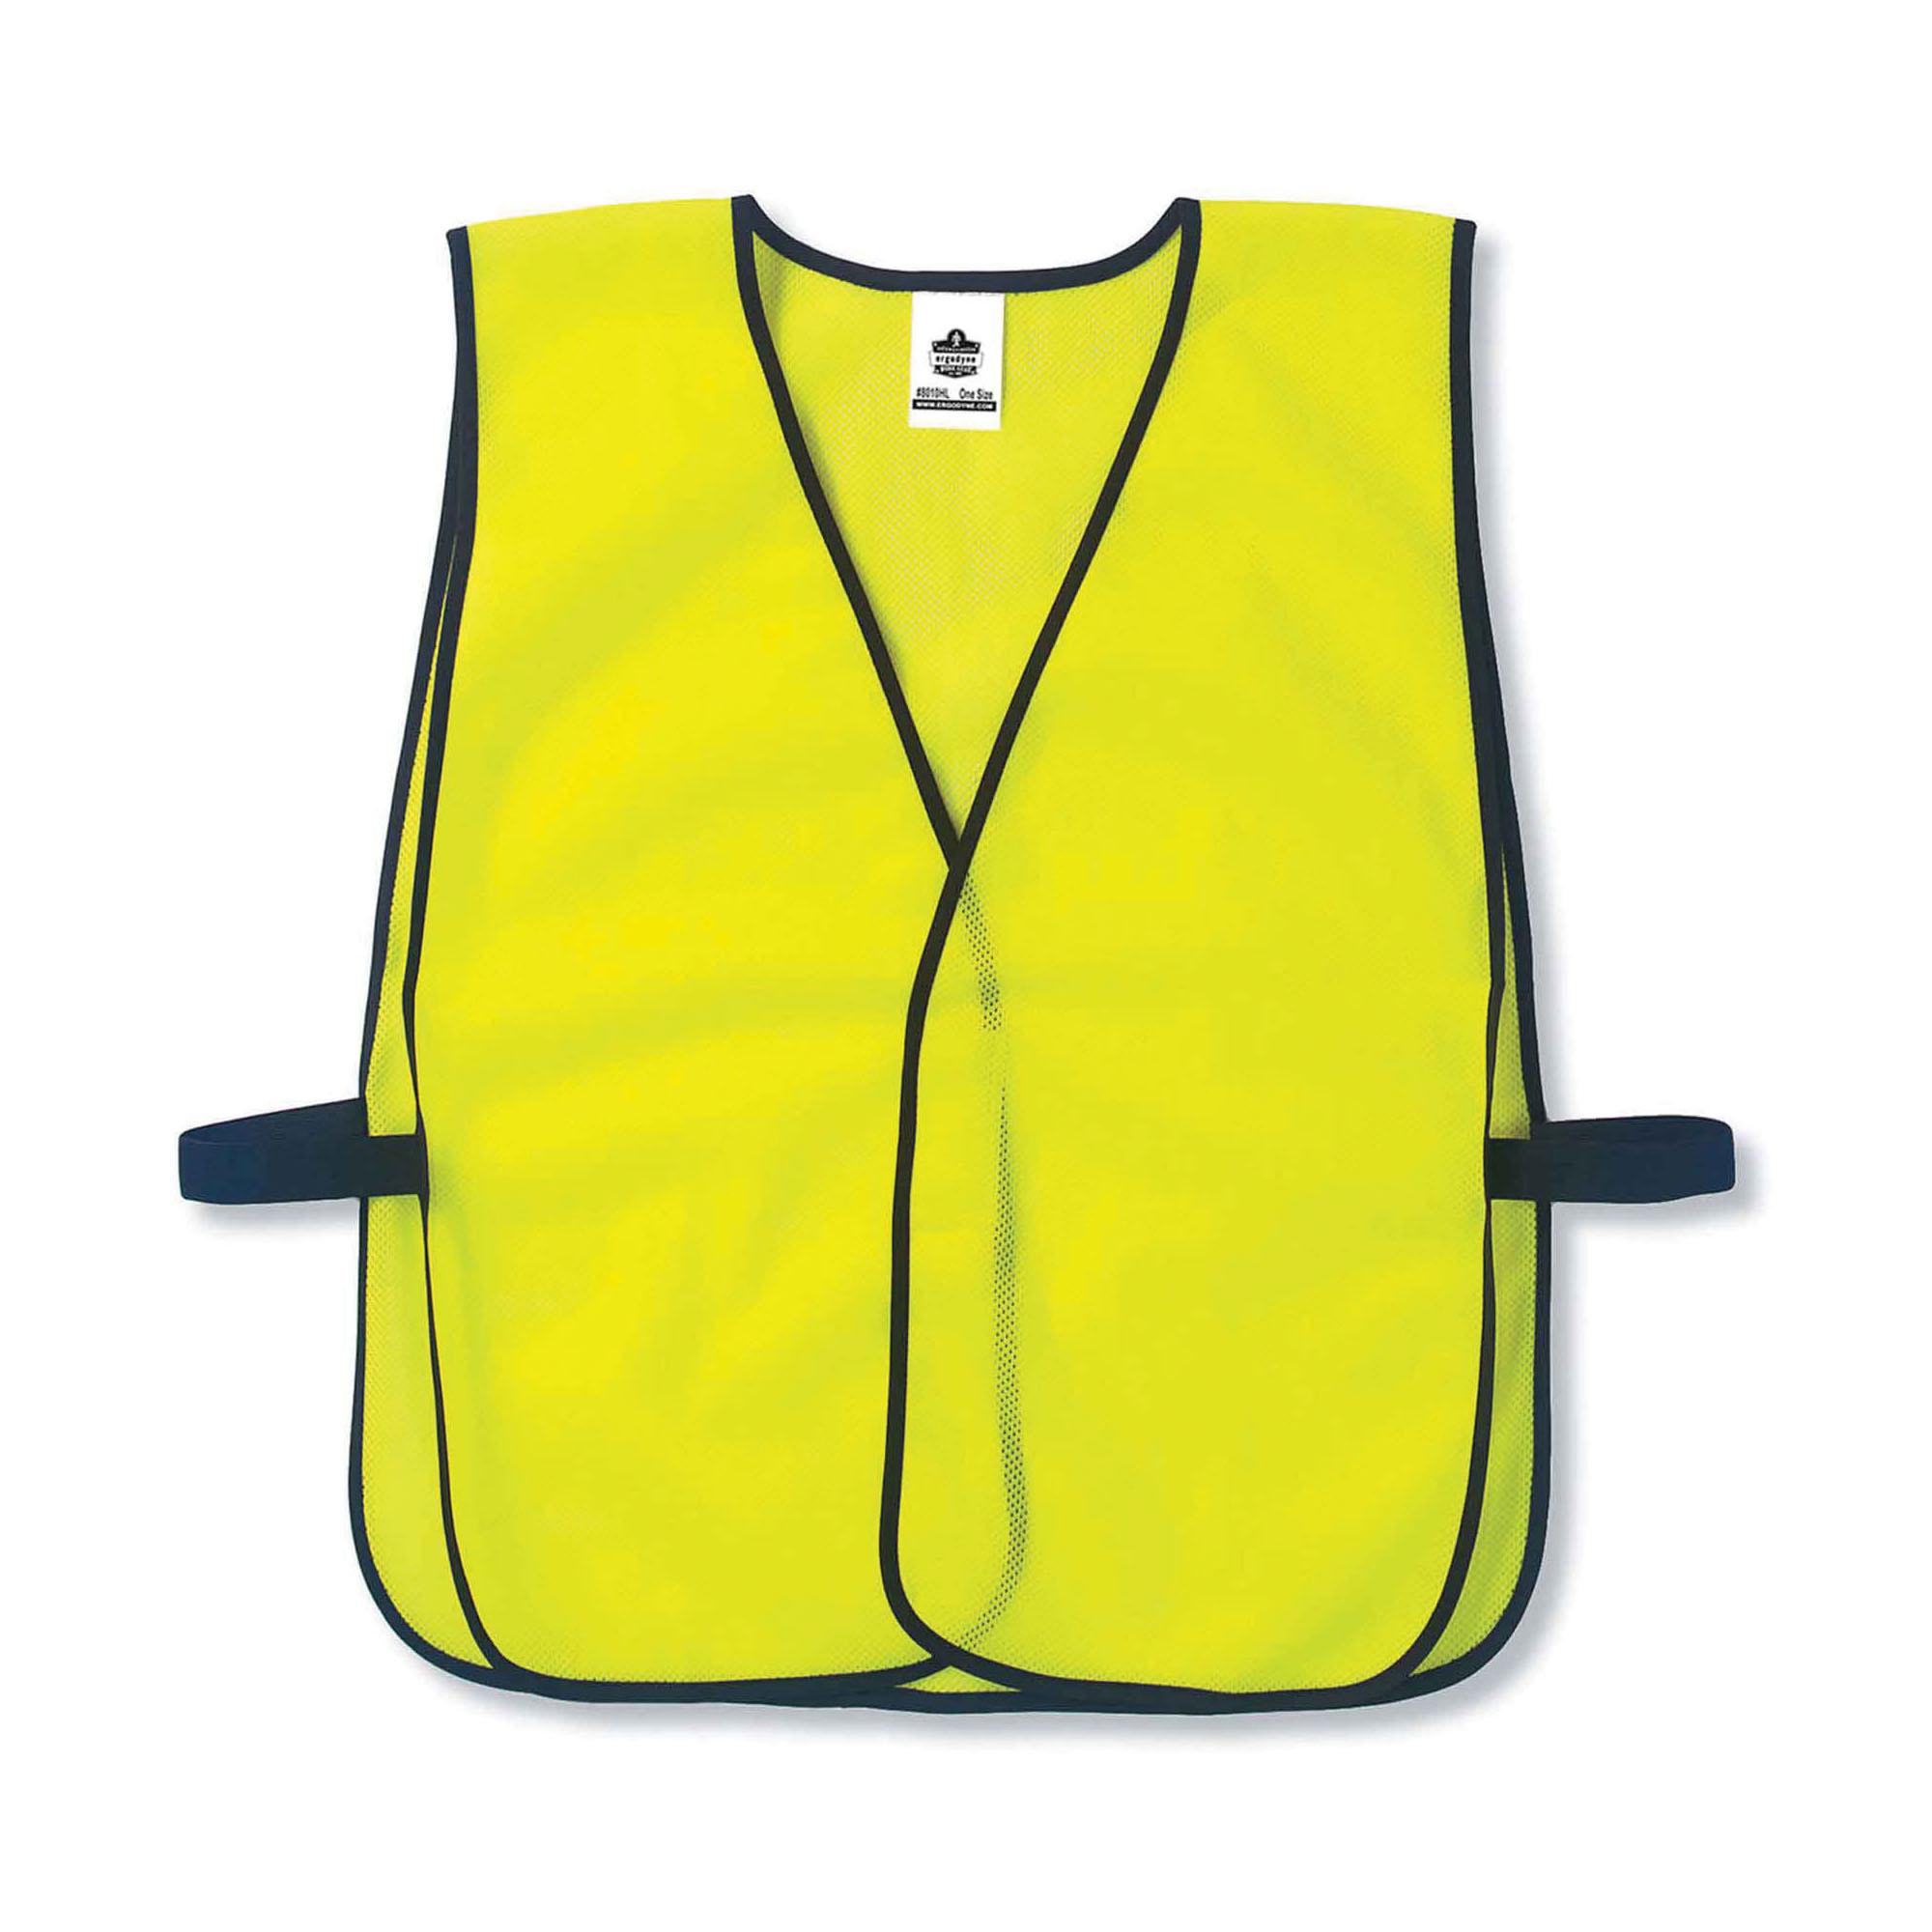 GloWear® 20010 8010HL Economy Non-Certified Safety Vest, Universal, Hi-Viz Orange, Polyester Mesh, Hook and Loop Closure